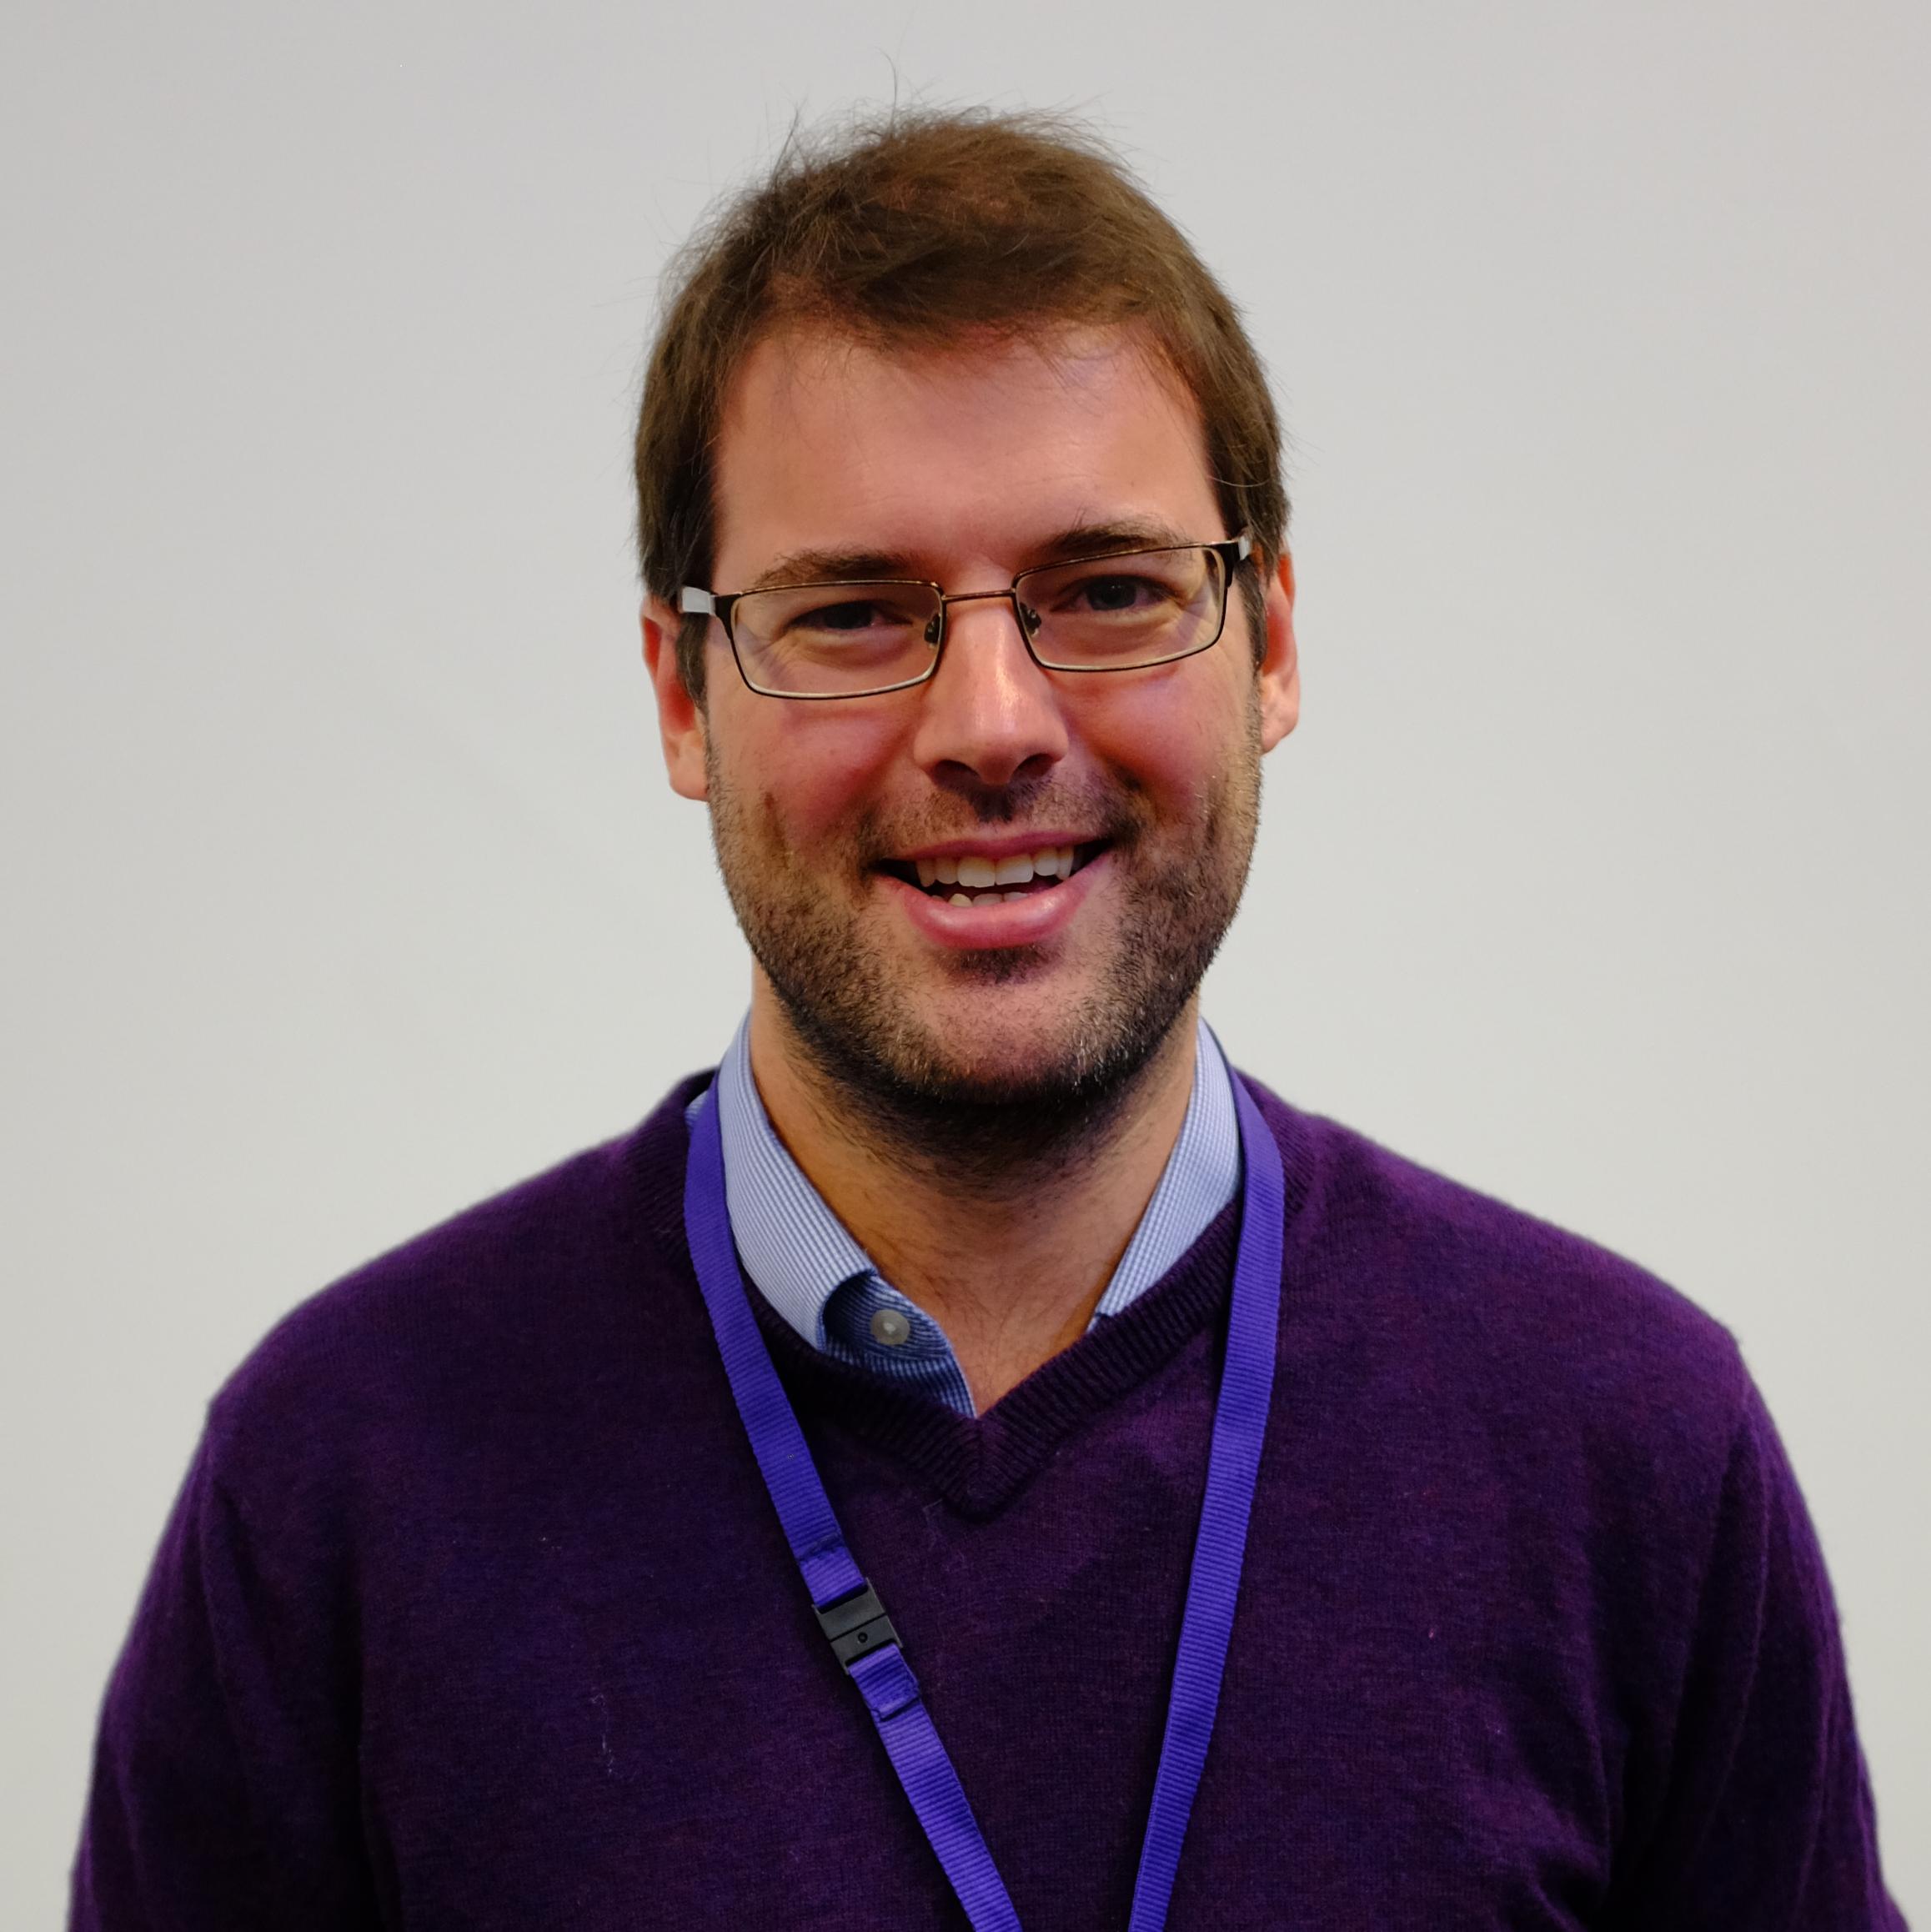 James Heale